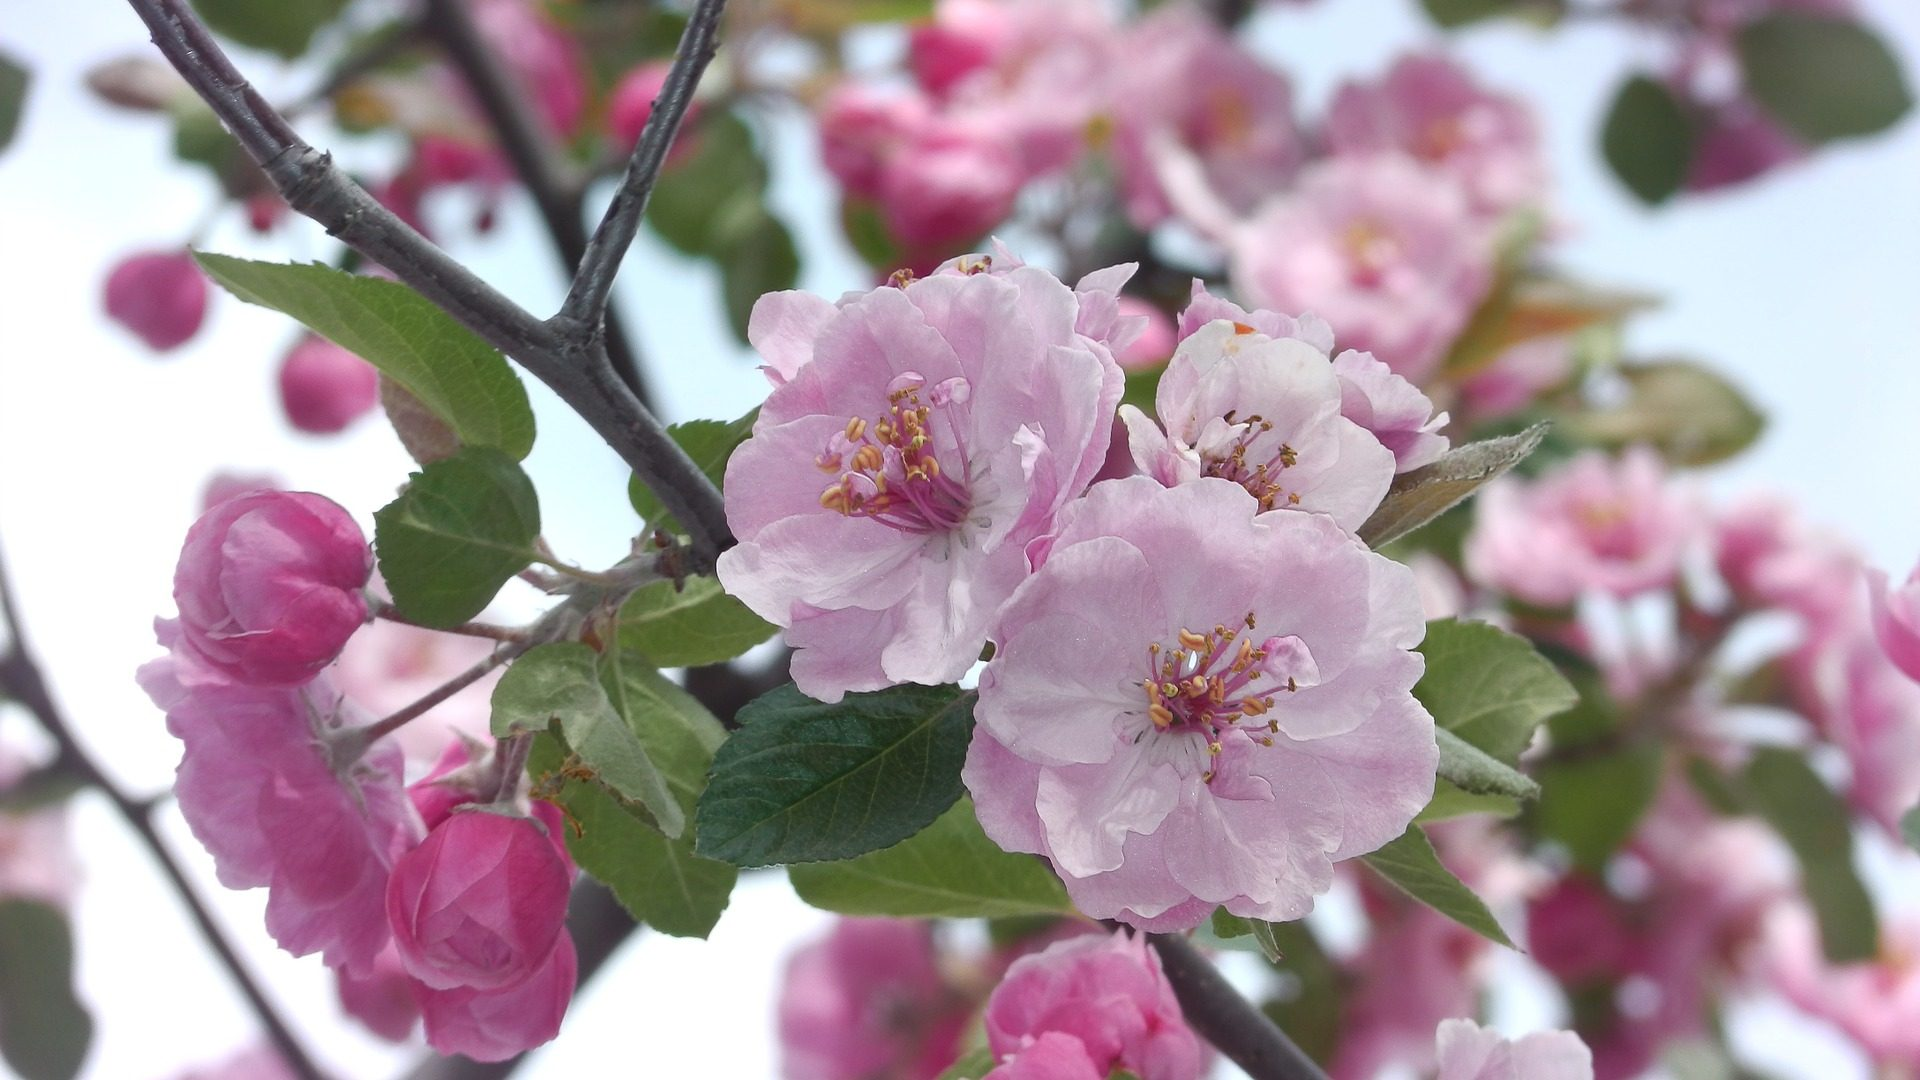 apricot blossom-1188141_1920